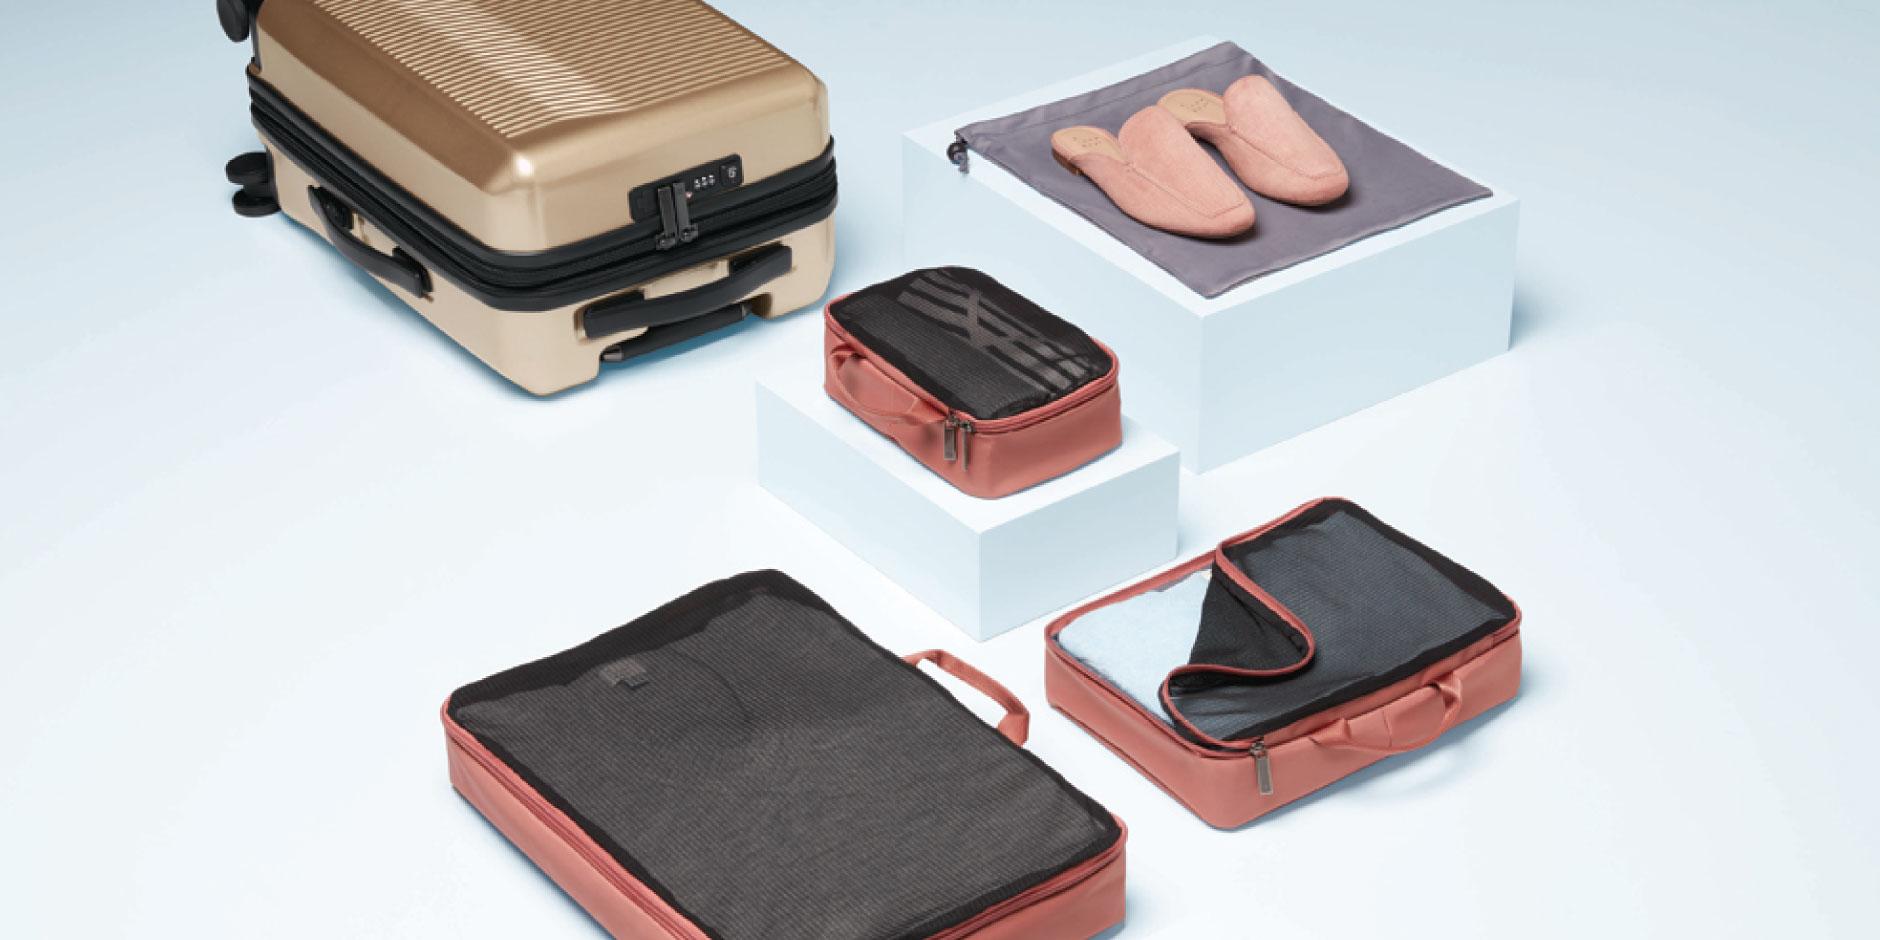 Target's New Designer-Like Luggage Line Is All Under $200 | Hunker